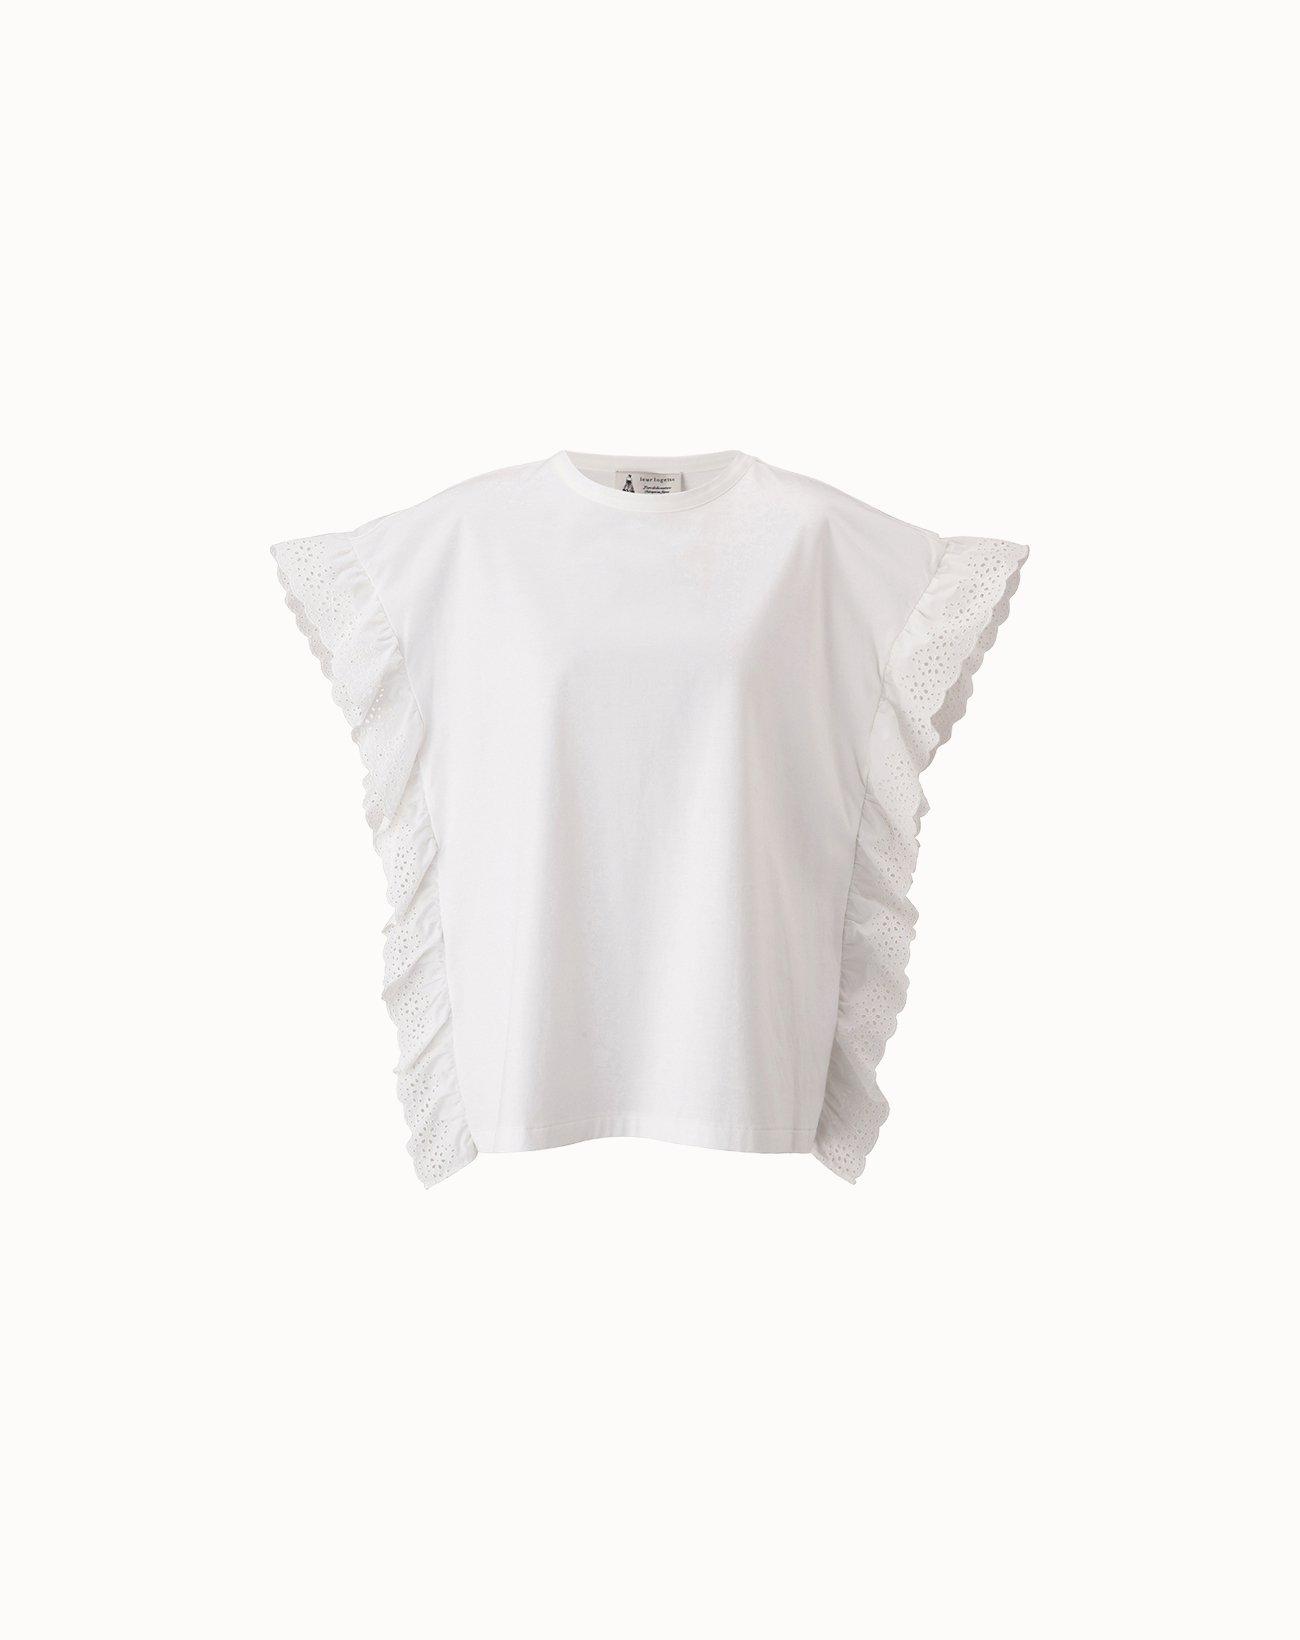 leur logette - Cotton Sleeveless Top - White